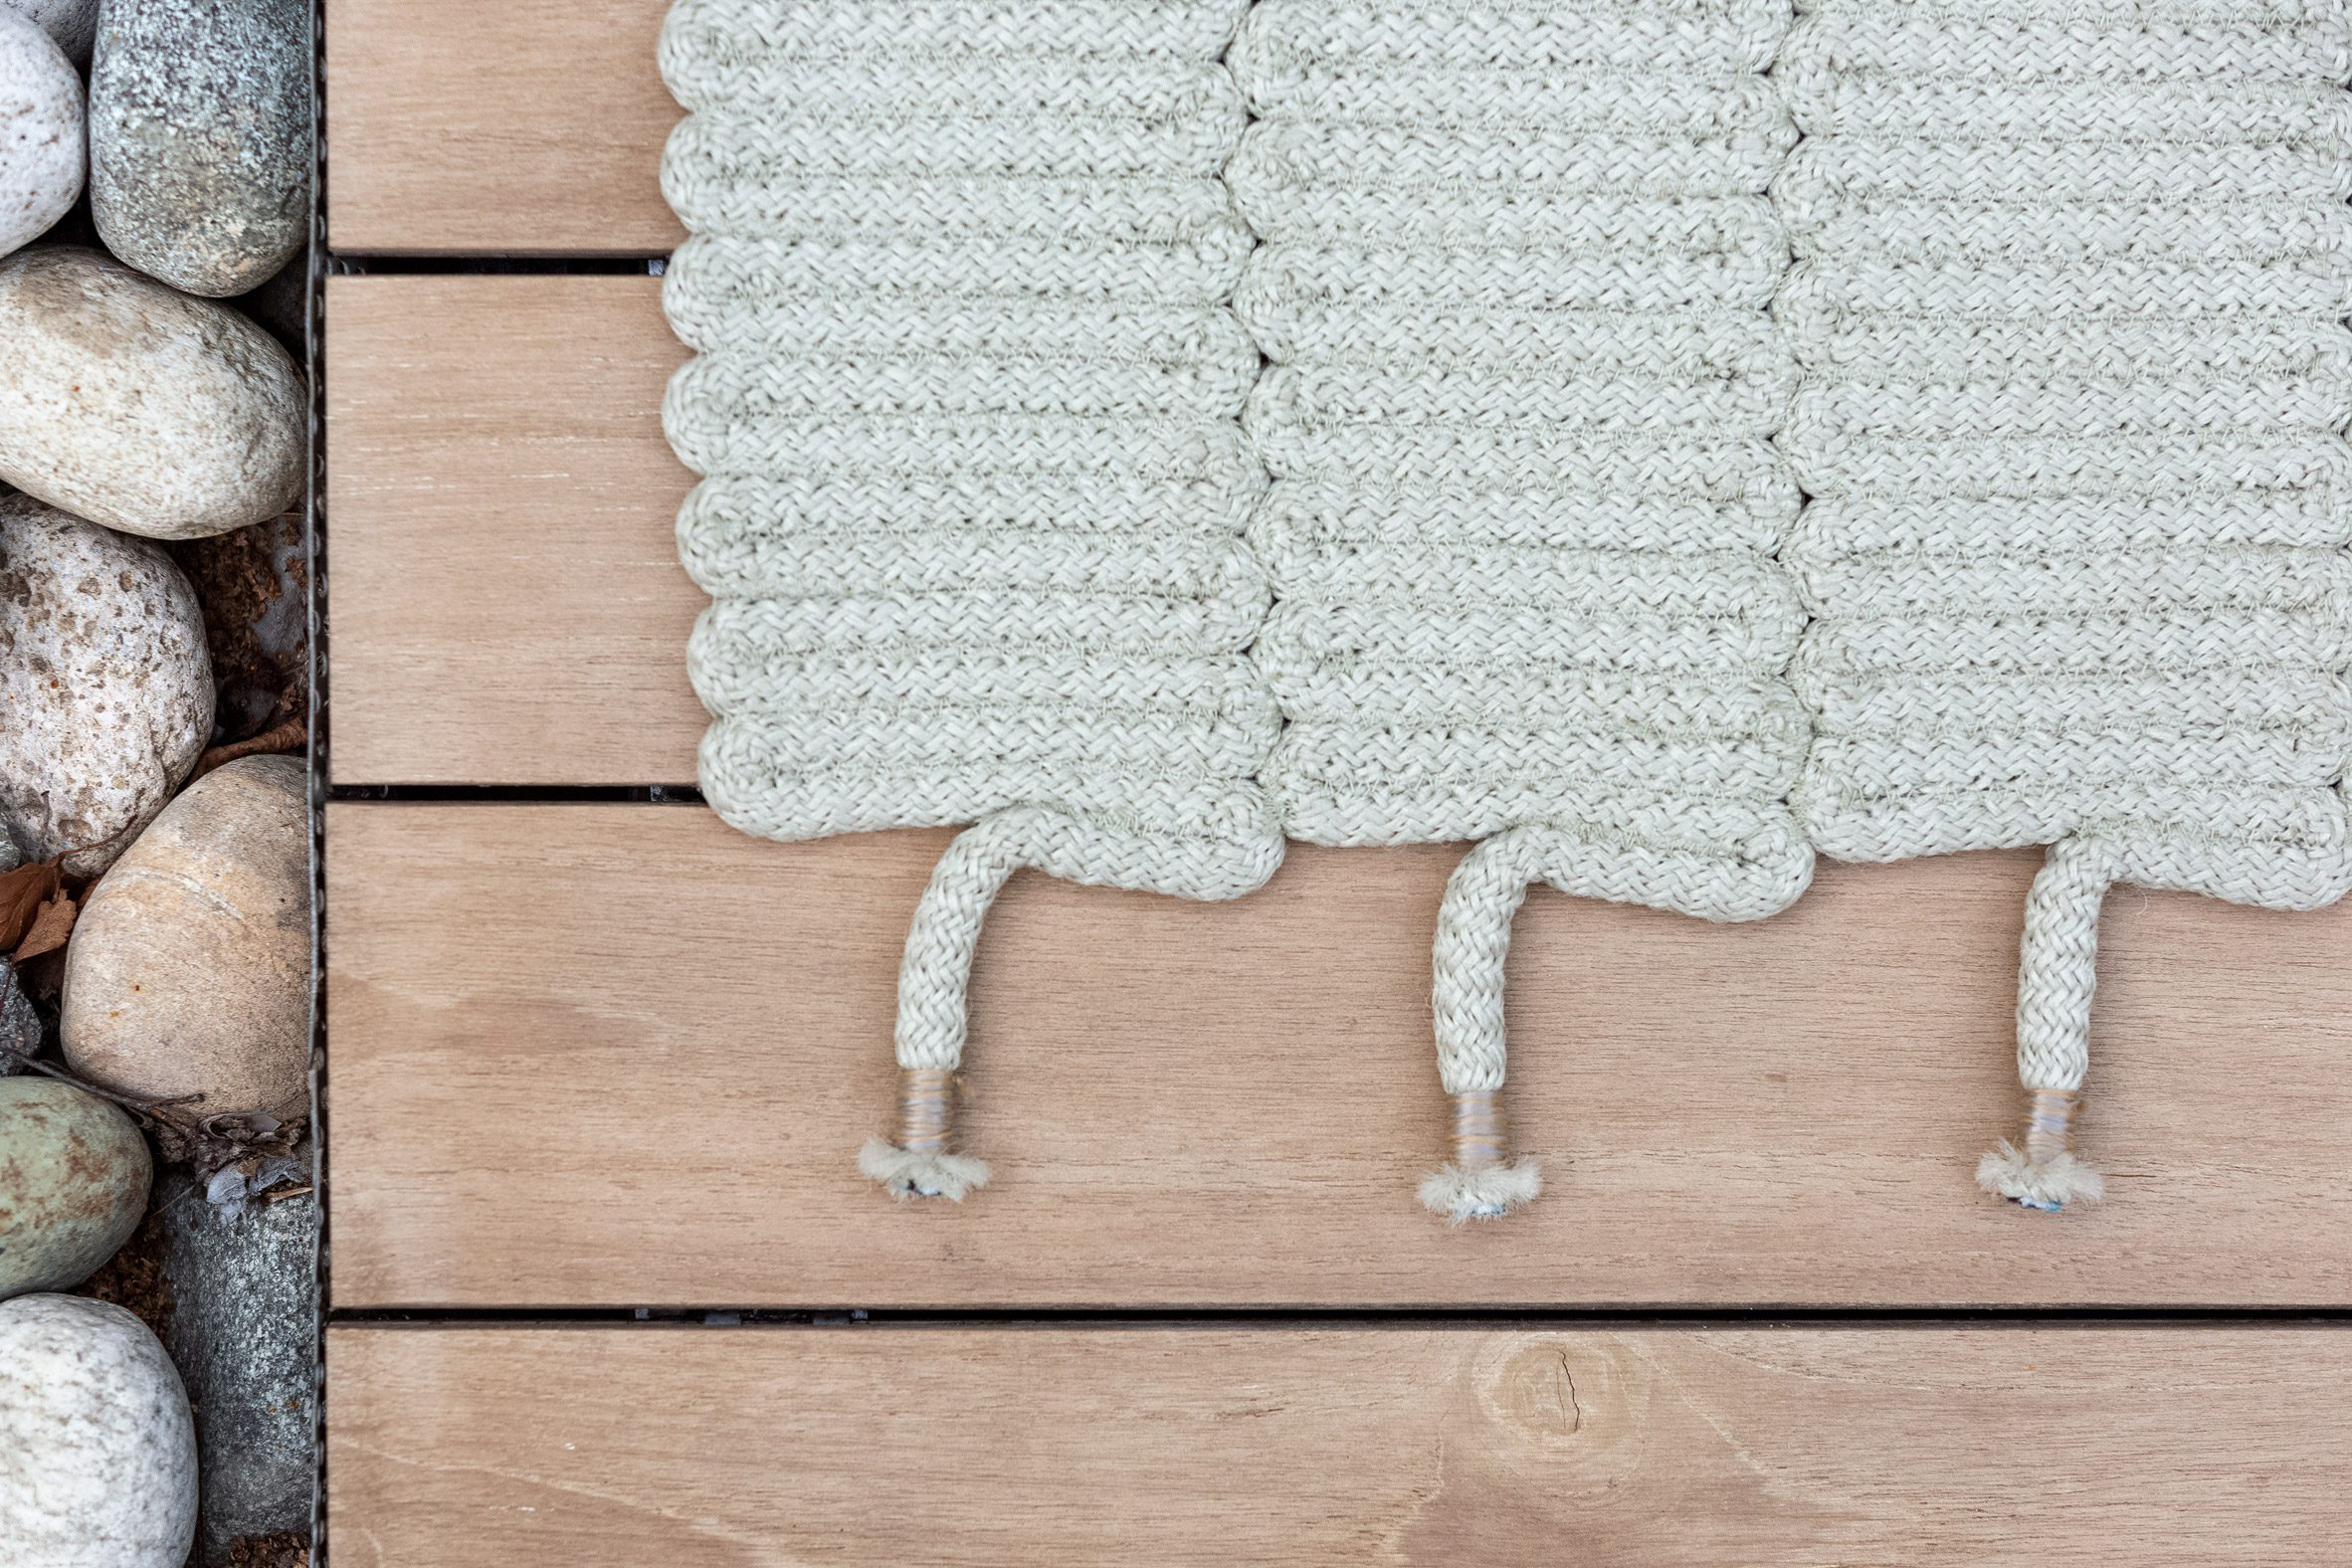 Pleiadi rug by Paolo Zani for Warli